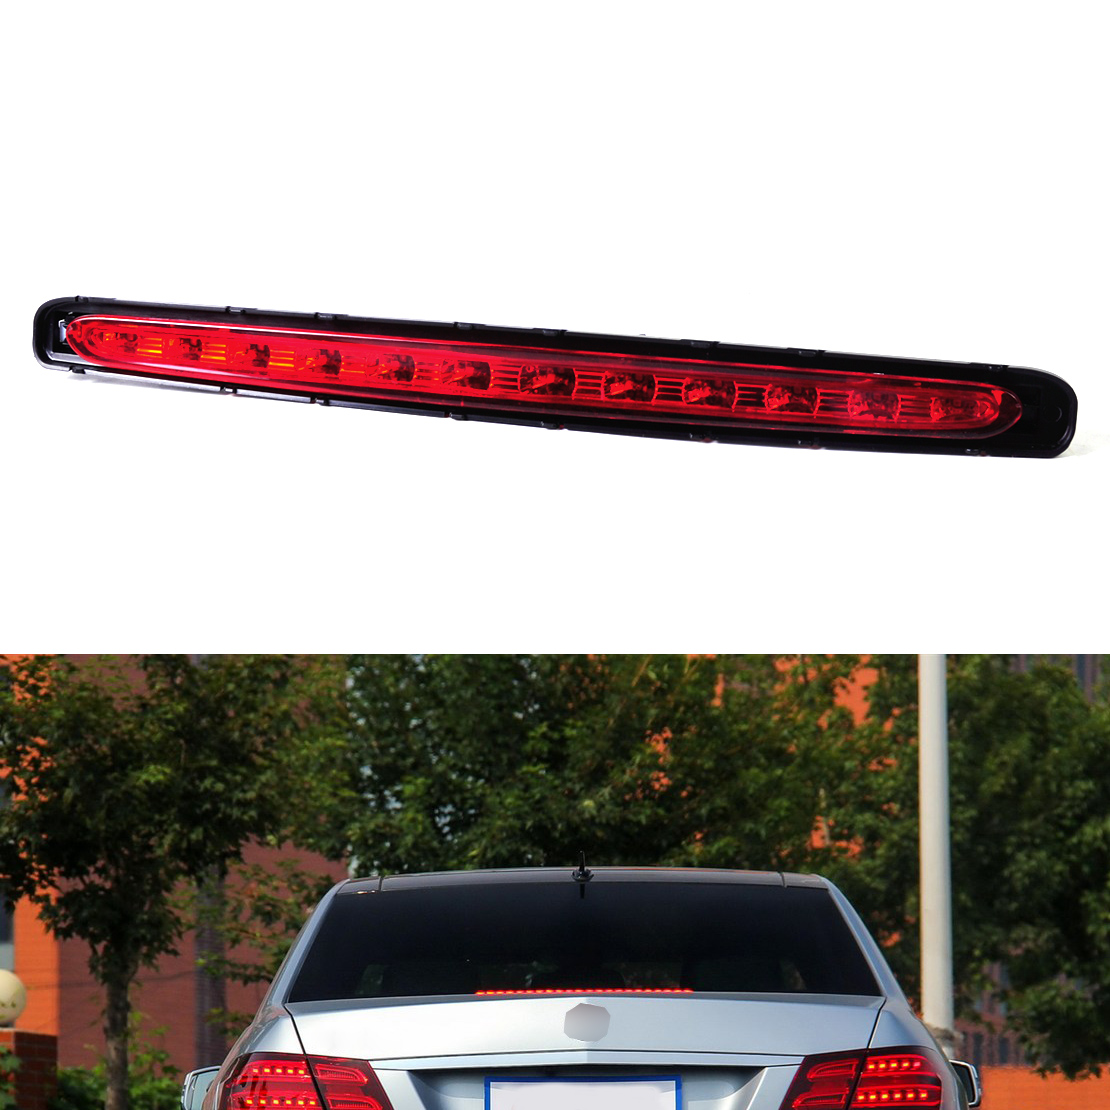 DWCX 2118201556 Car Rear LED Third Stop Brake Light Lamp for Mercedes Benz E Class W211 2003 2004 2005 2006 2007 2008 2009<br>